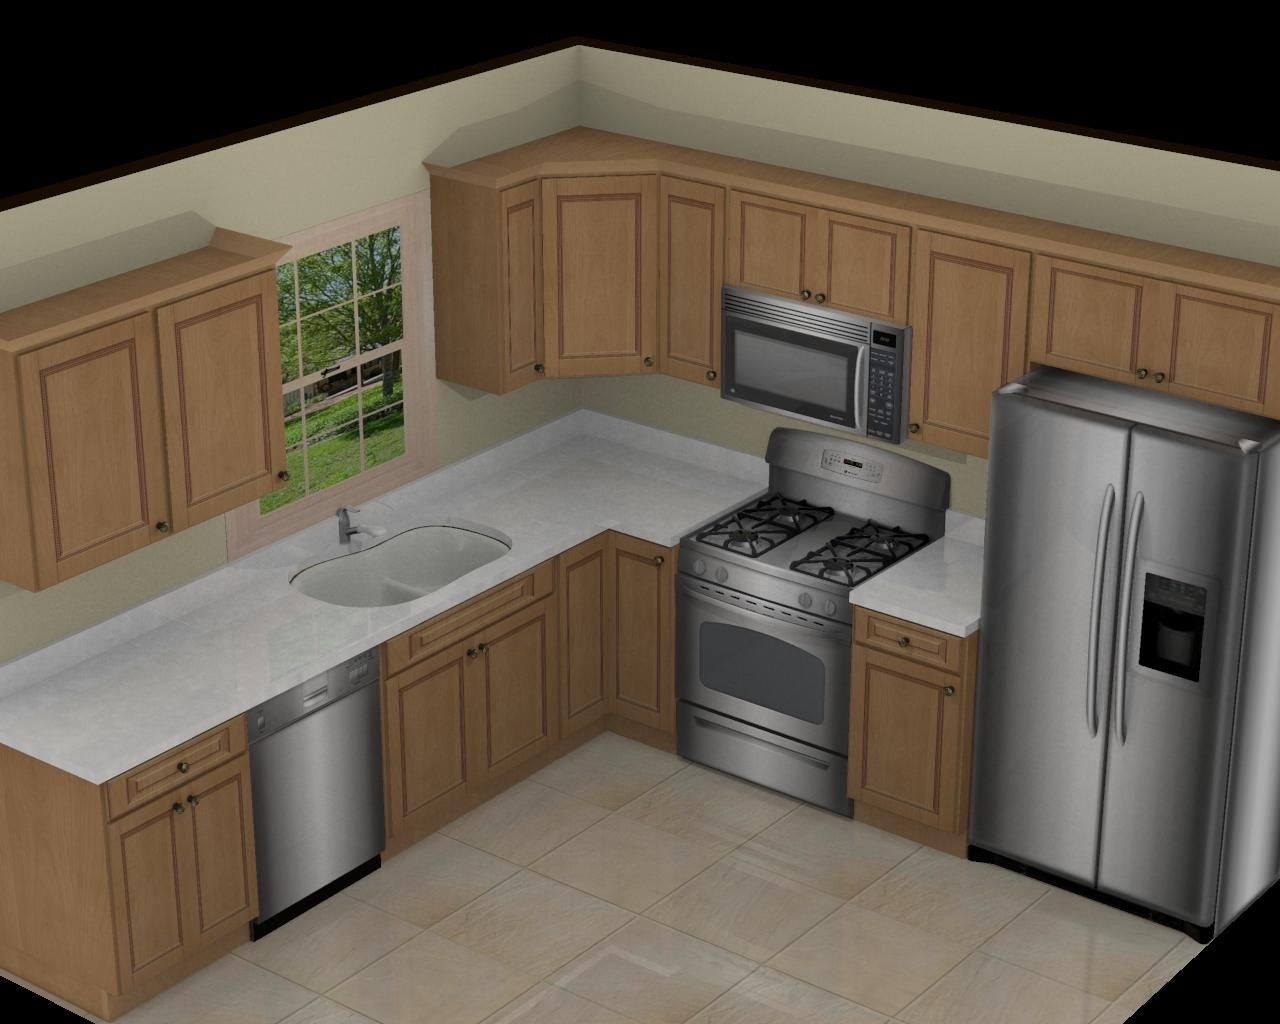 10x10 kitchen design ikea sales 2014 small kitchen layouts small kitchen design layout on i kitchen remodel id=39878